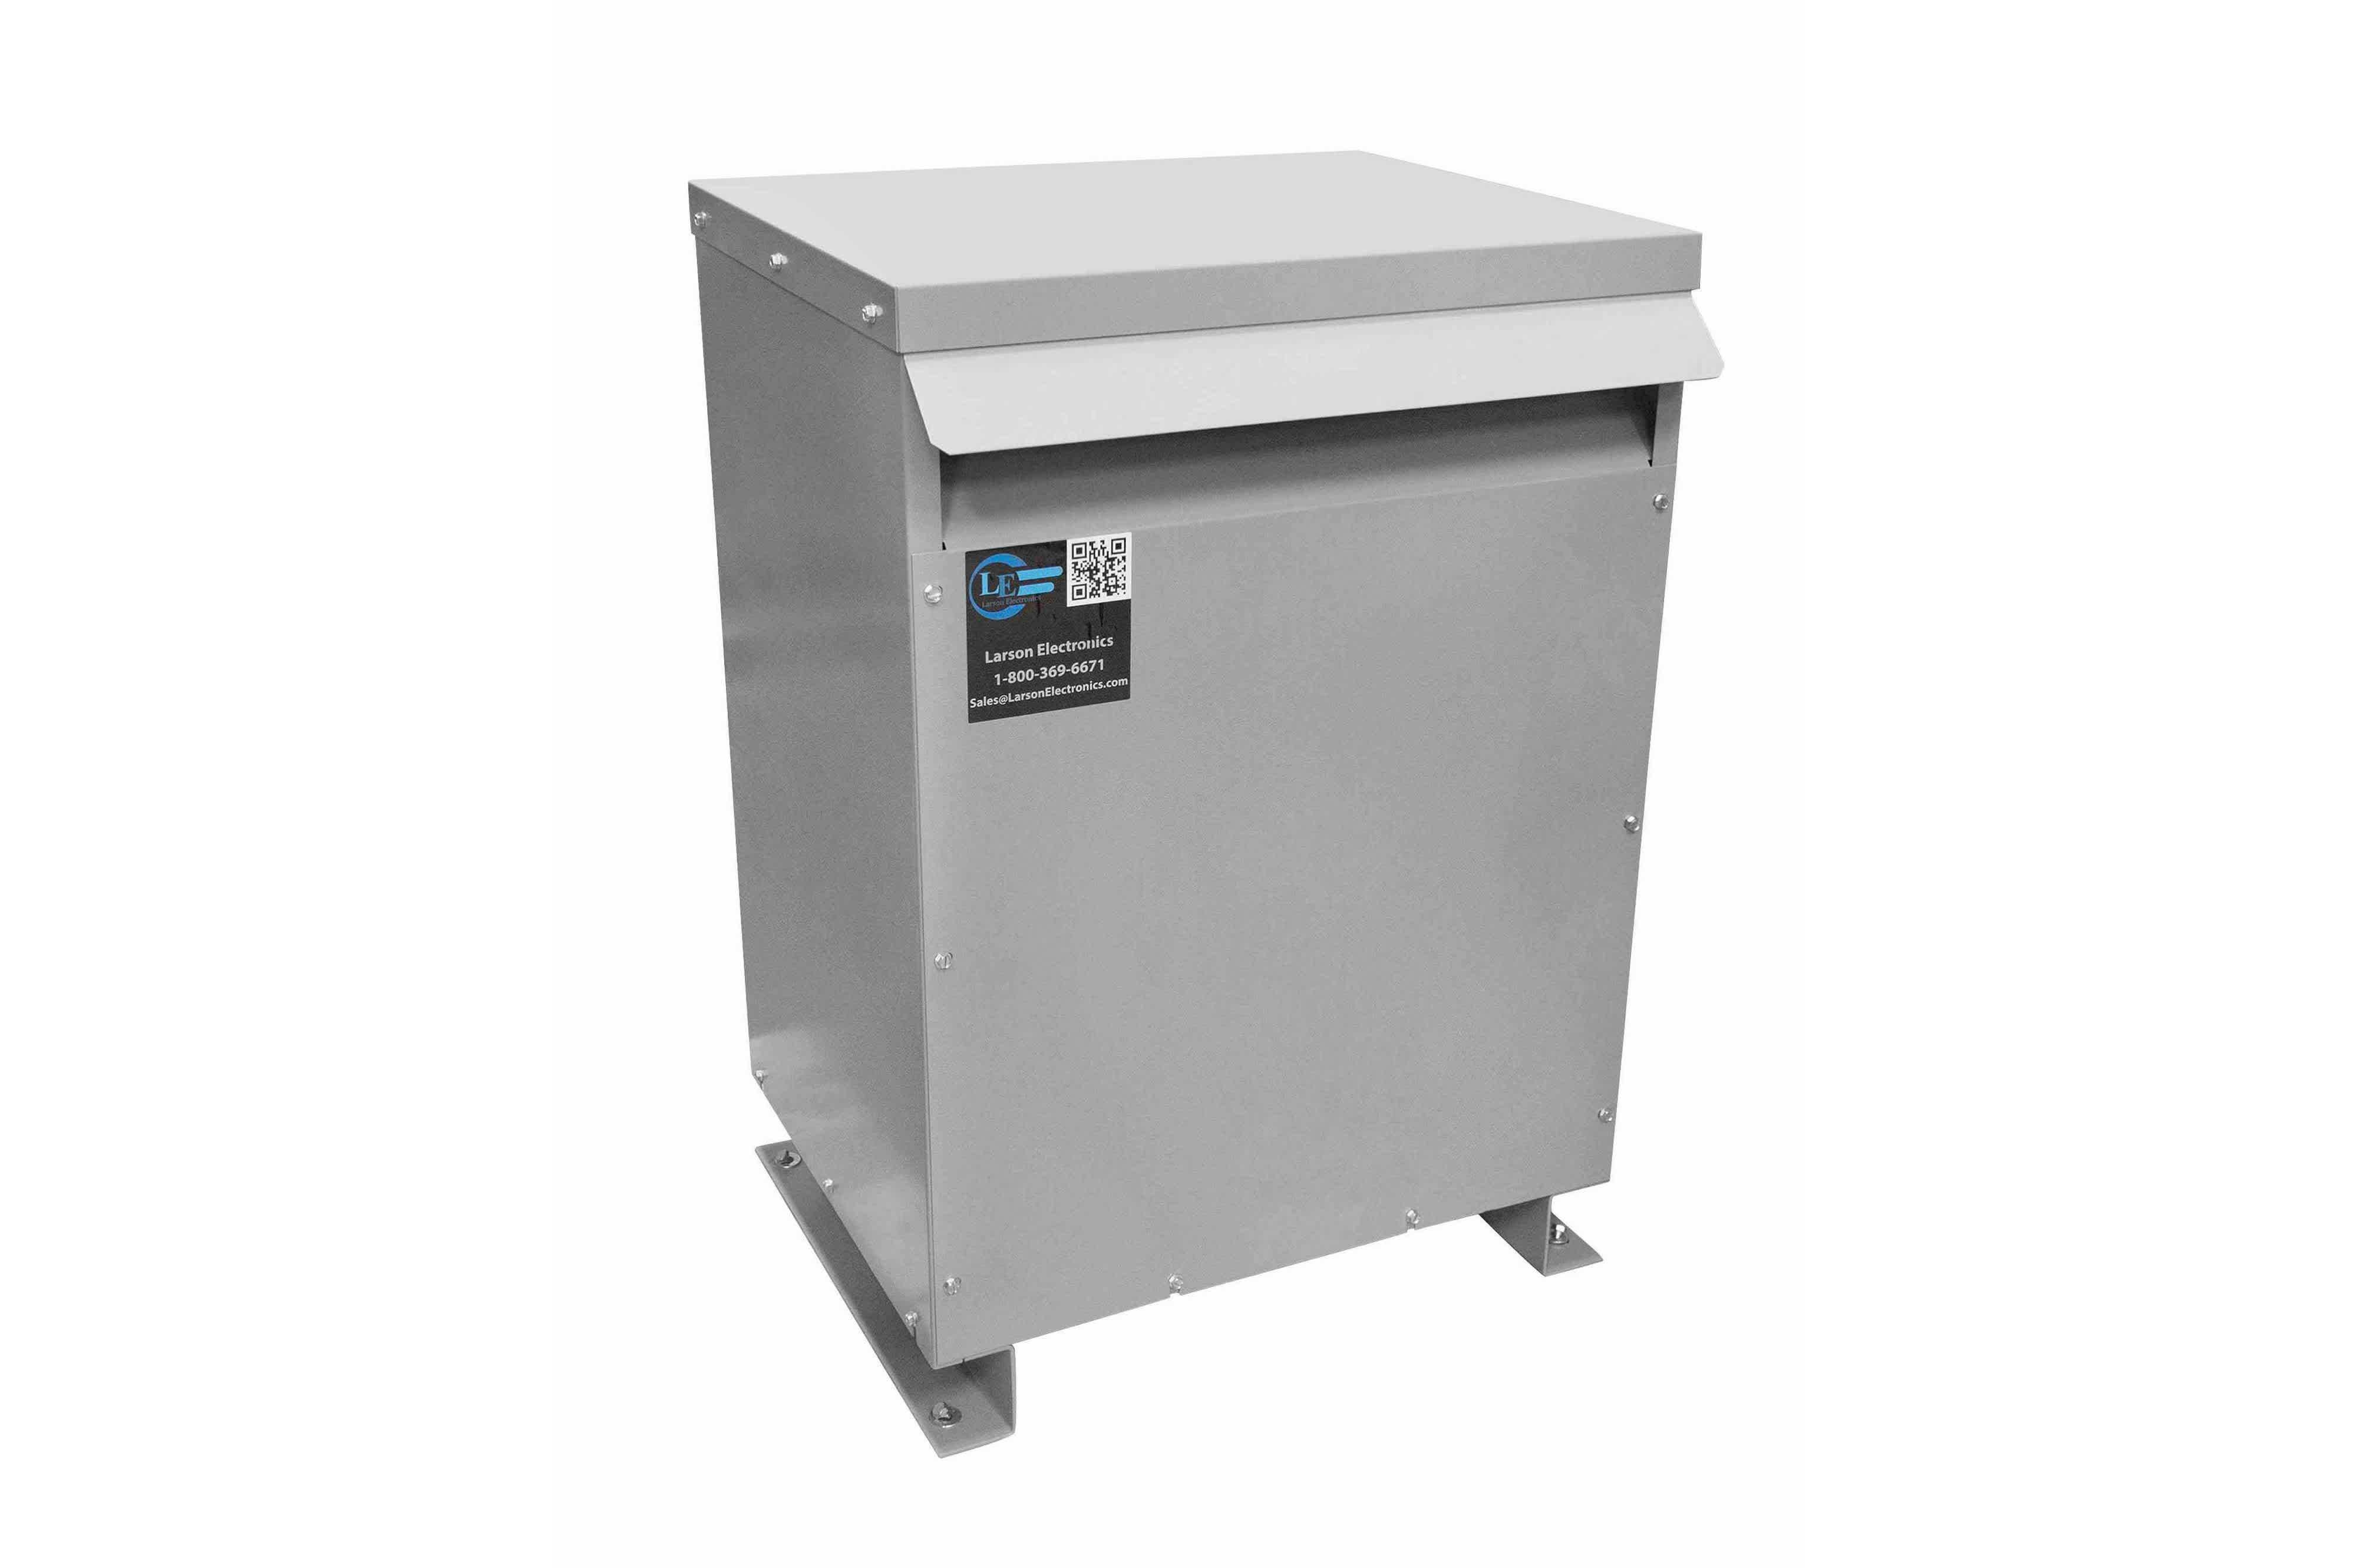 500 kVA 3PH Isolation Transformer, 240V Wye Primary, 415V Delta Secondary, N3R, Ventilated, 60 Hz